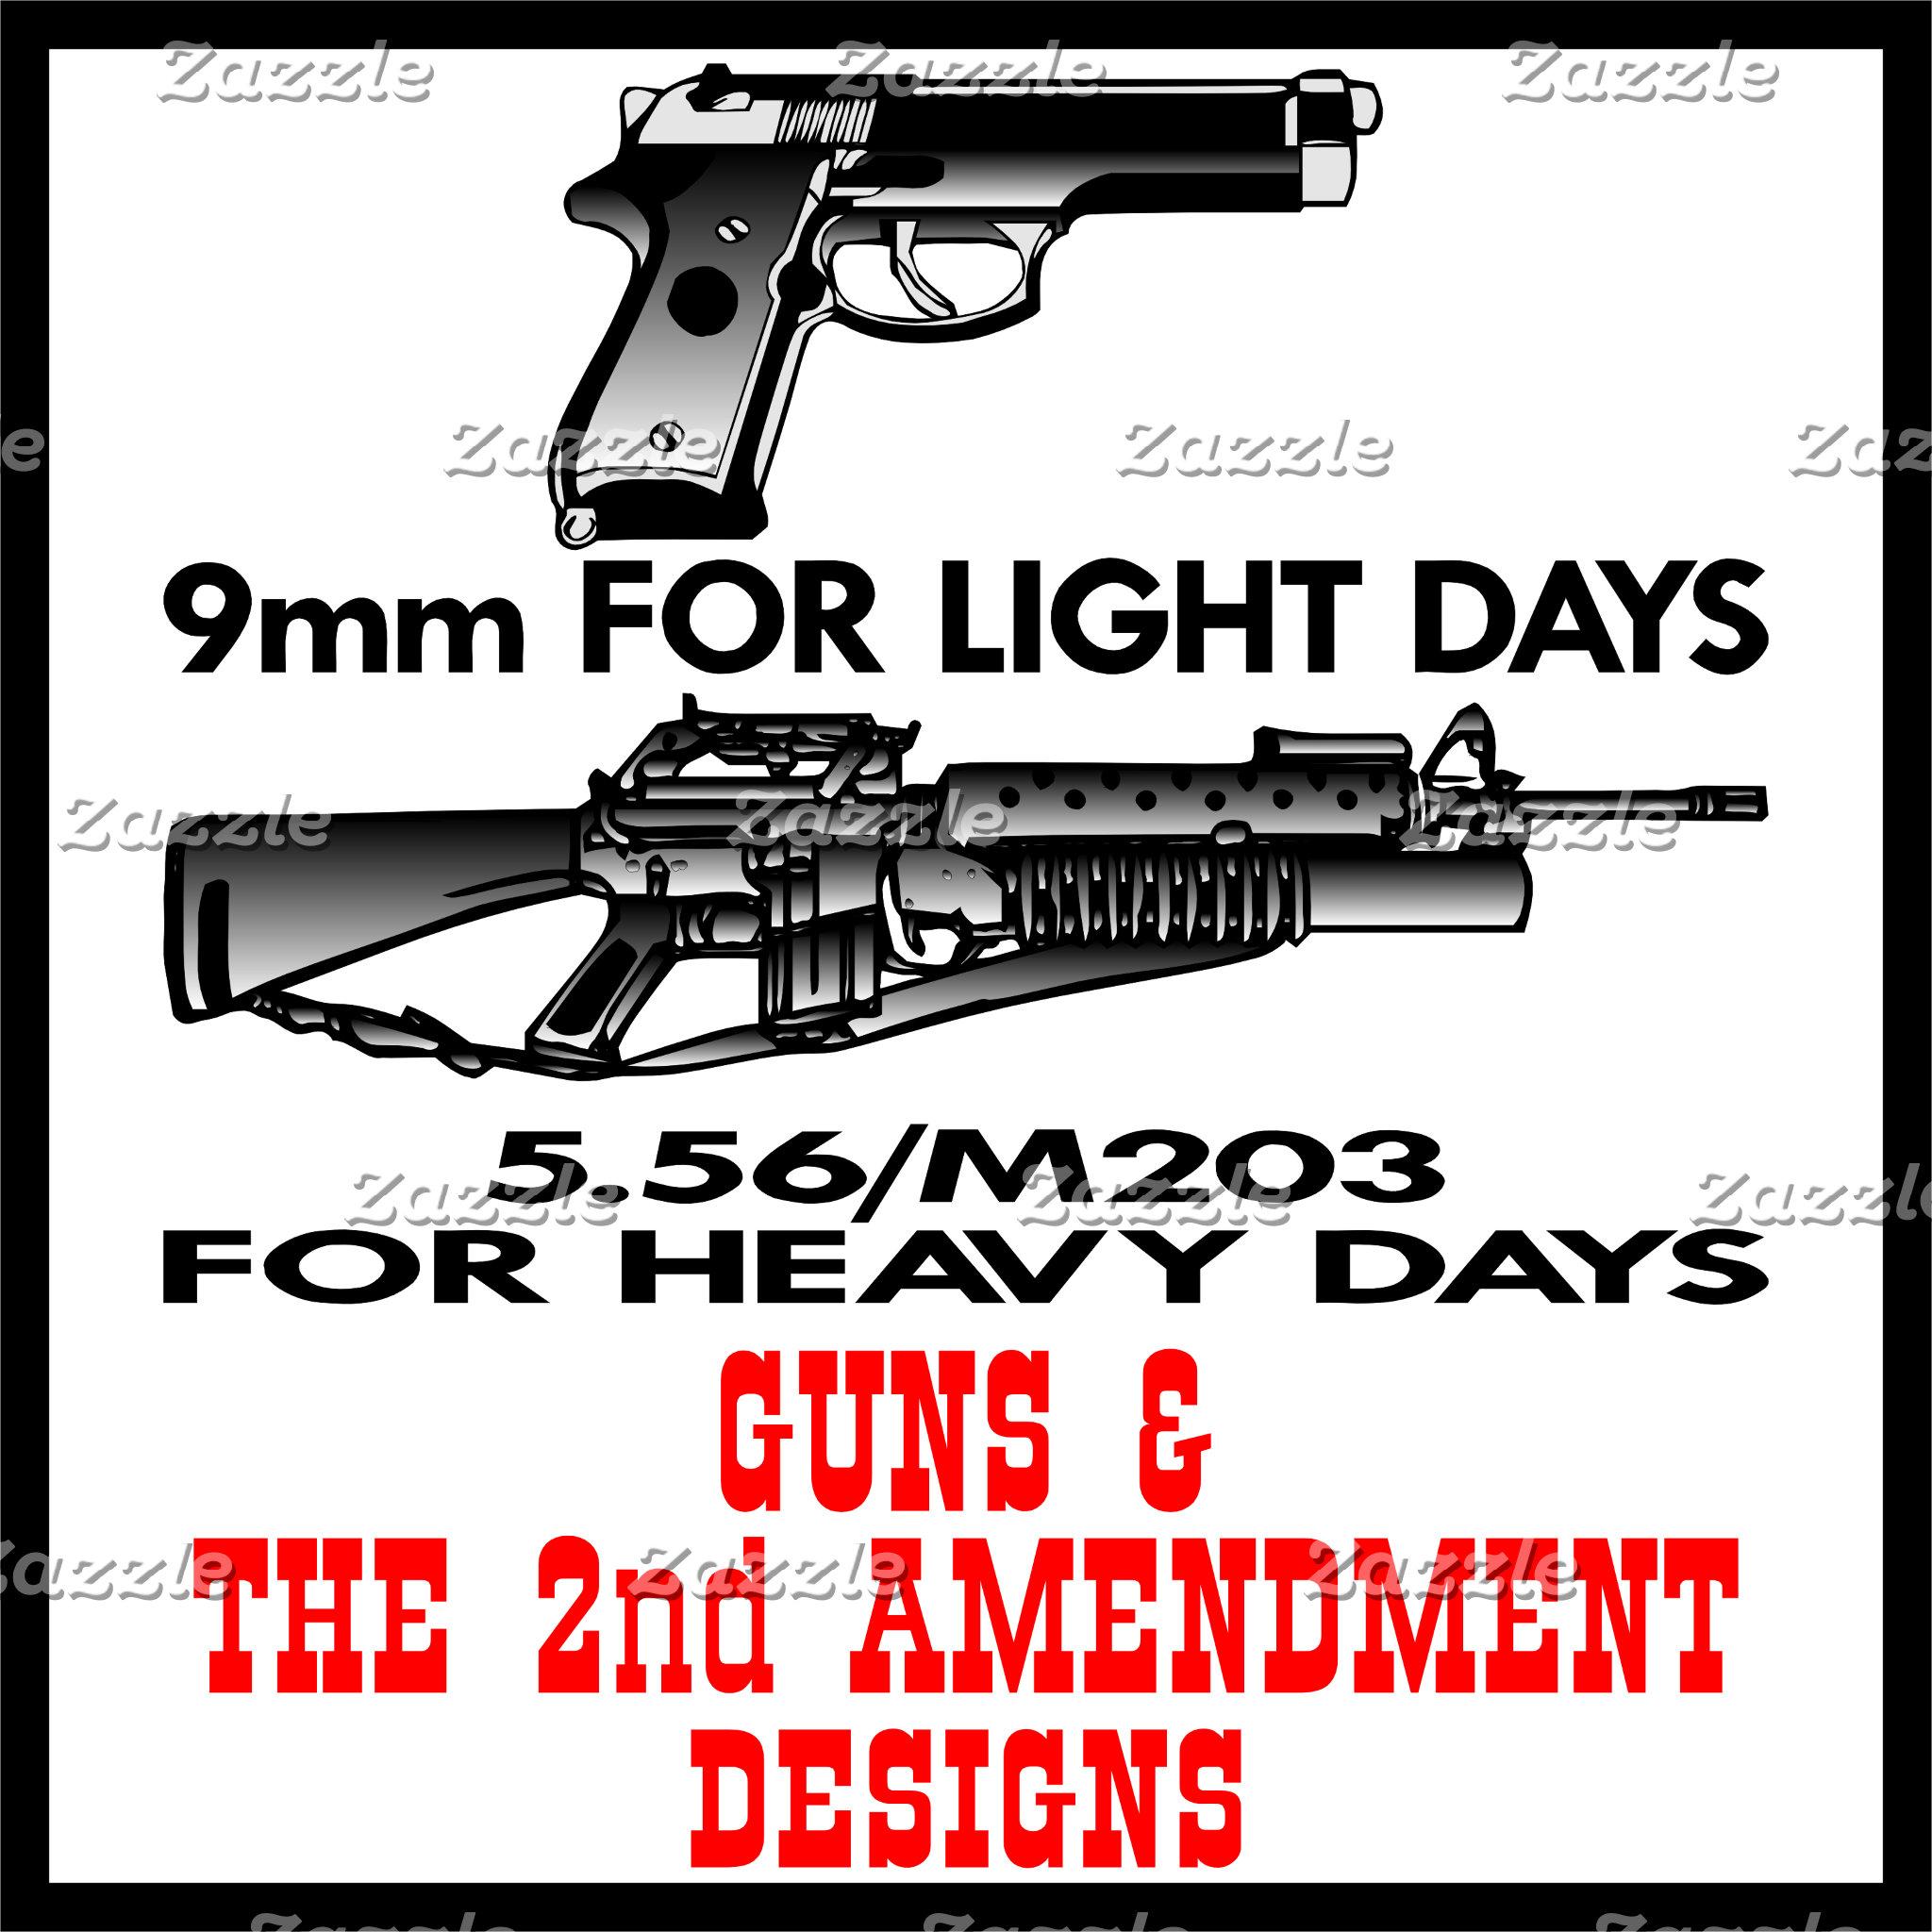 Guns & 2nd Amendment